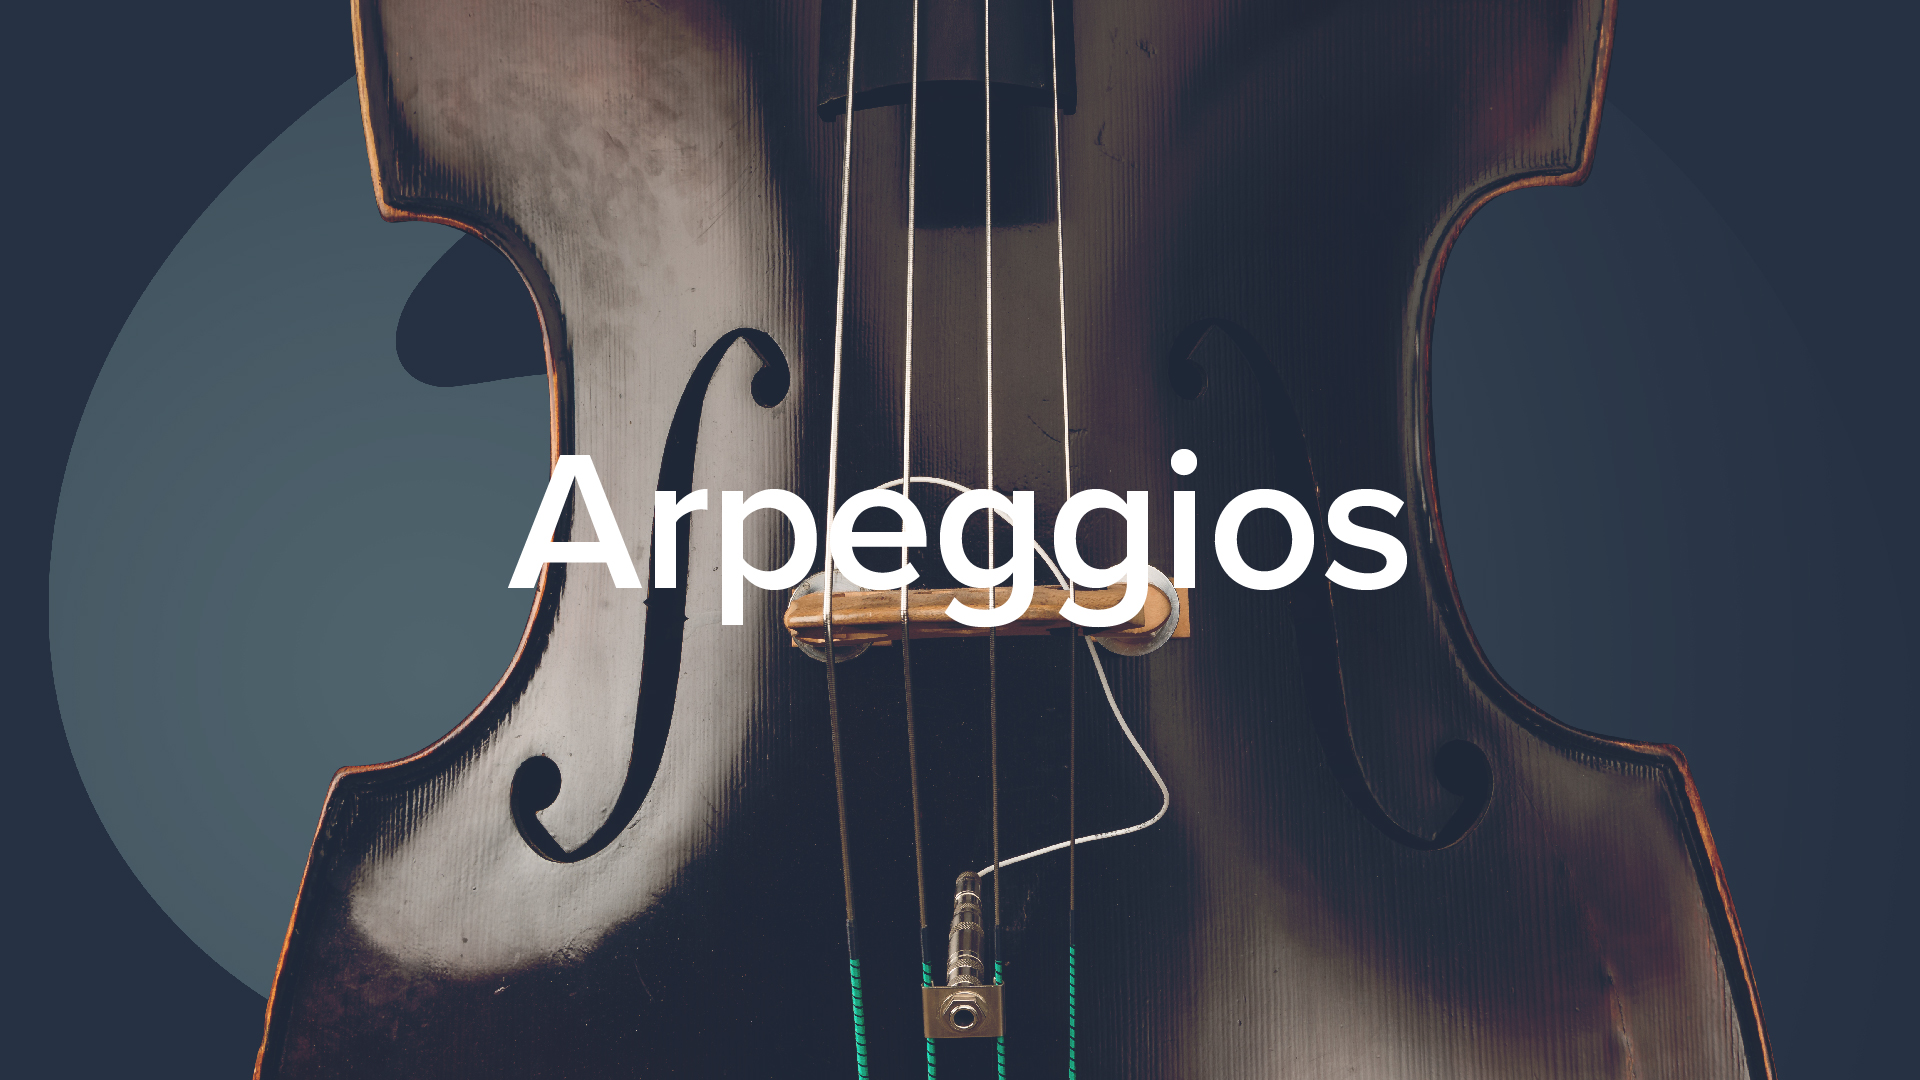 Double Bass Arpeggios - Arpeggios